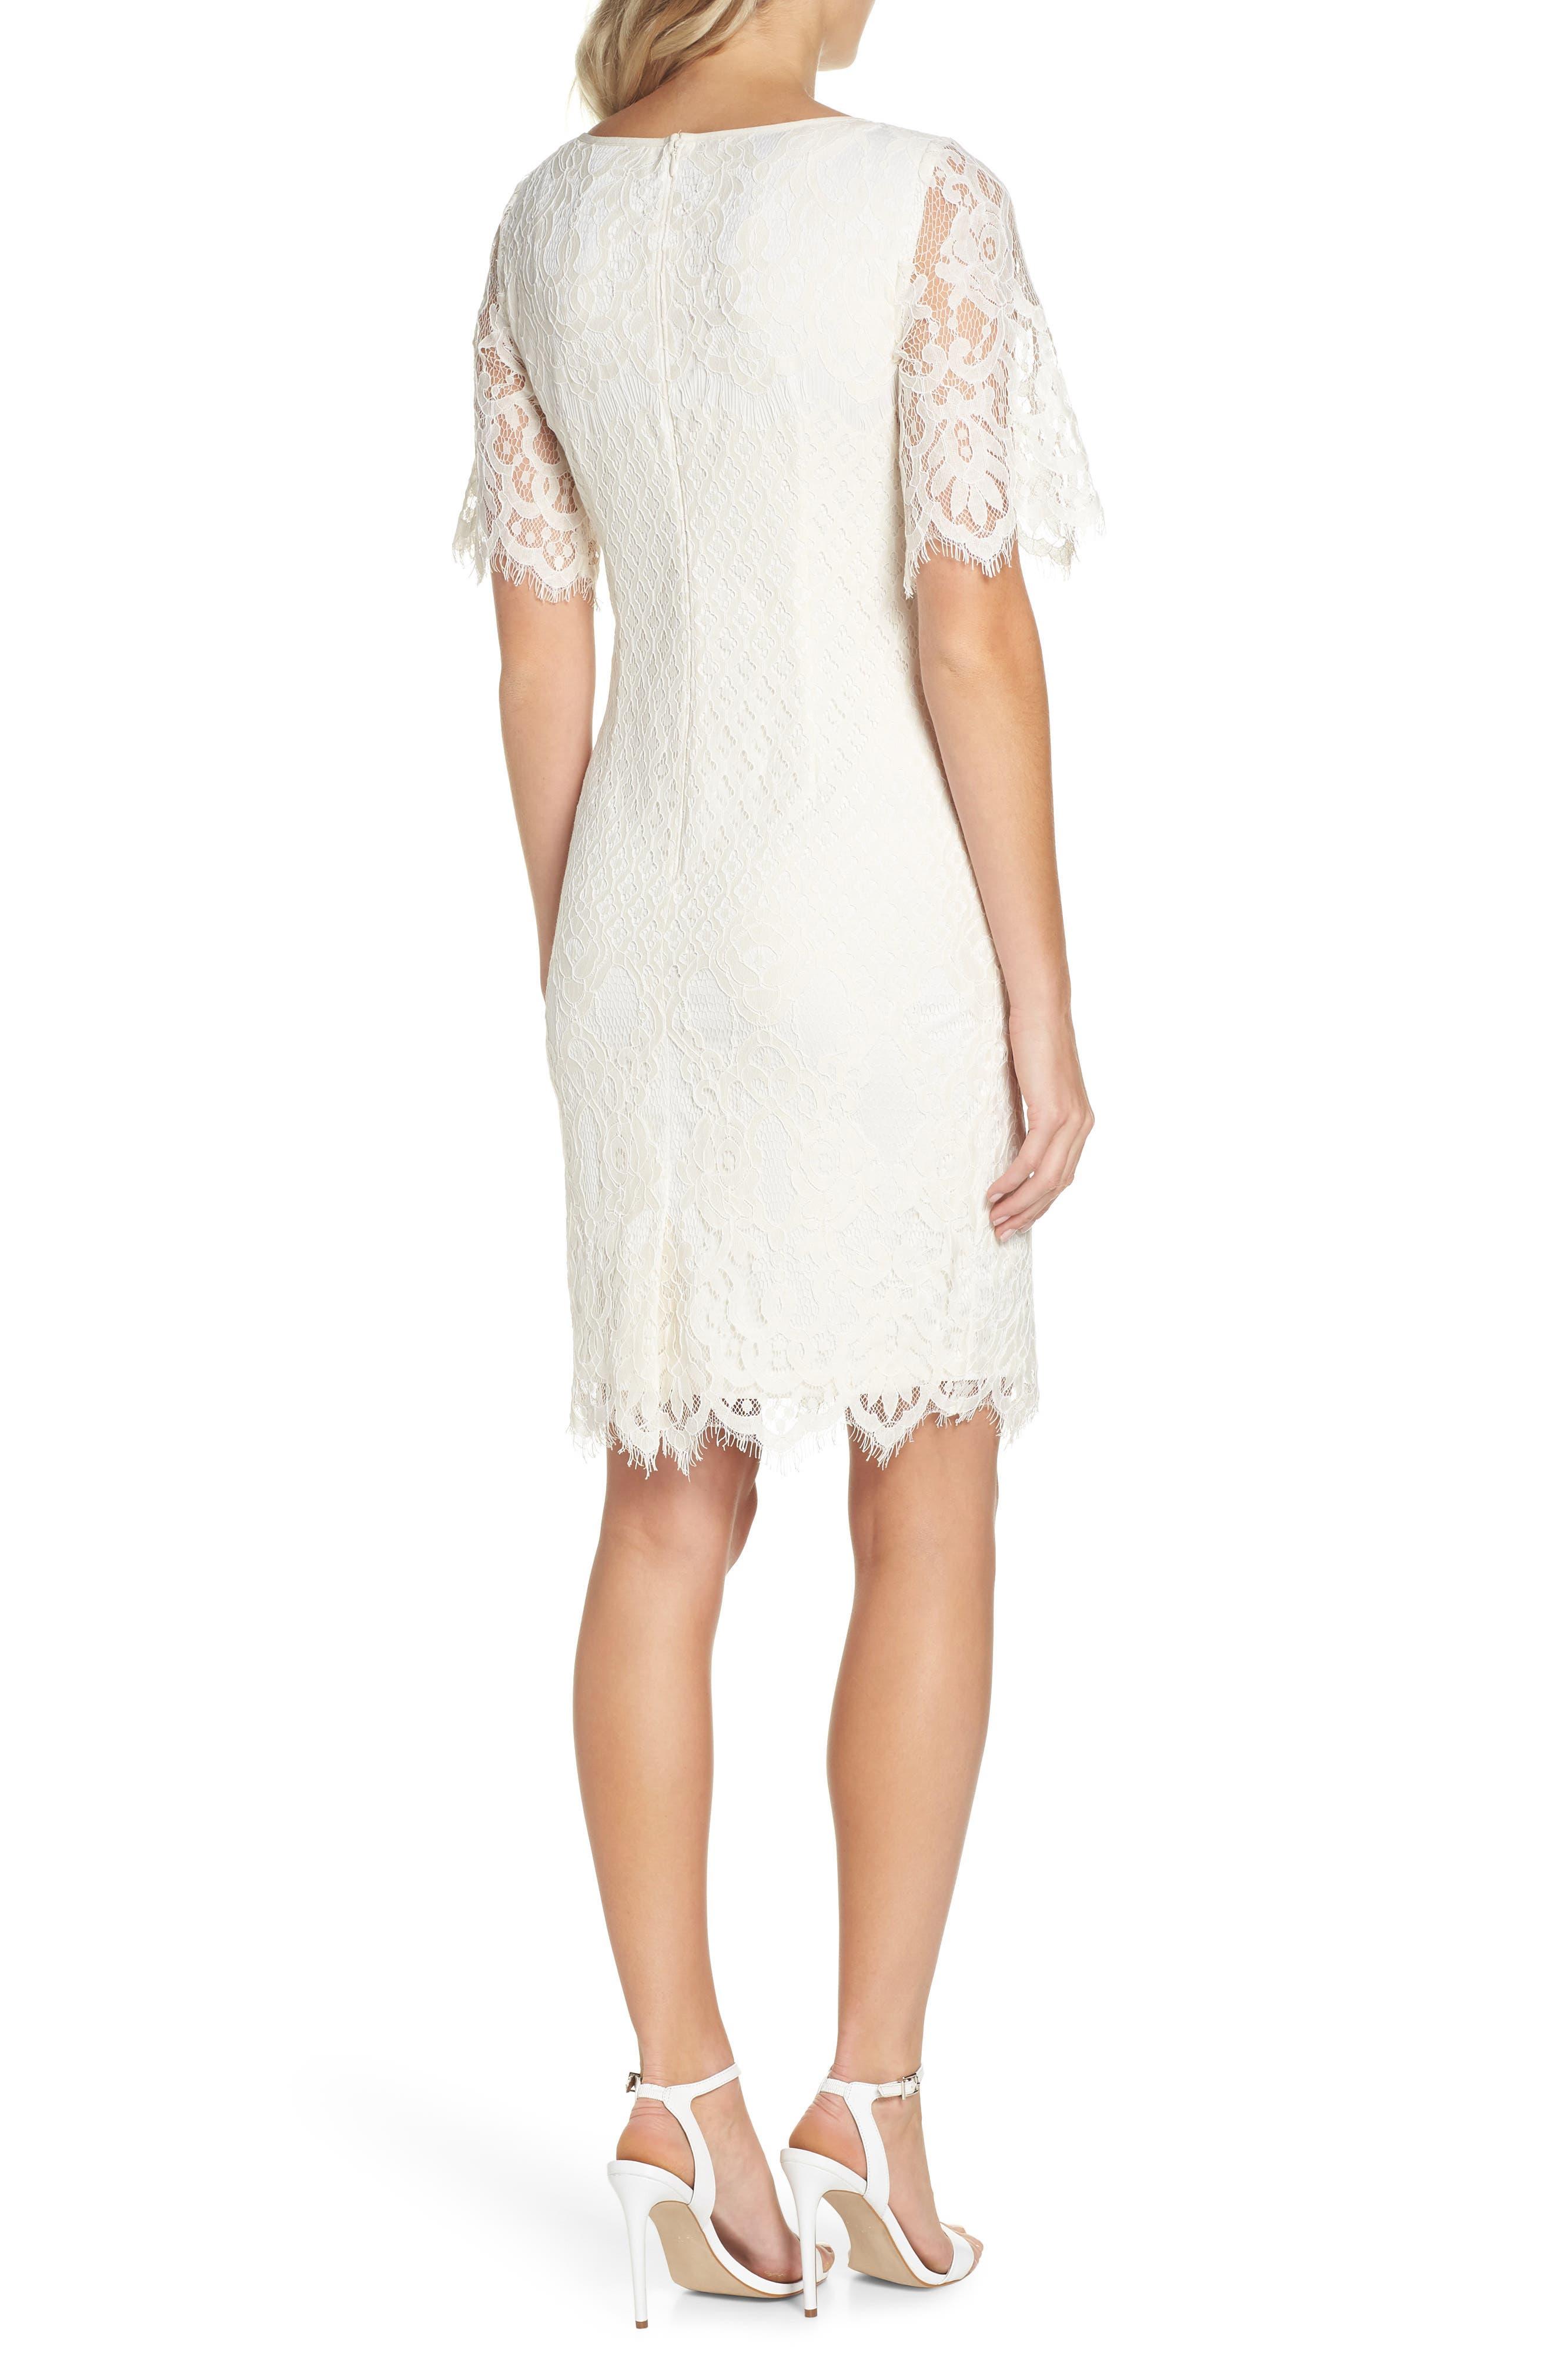 Georgia Scalloped Lace Sheath Dress,                             Alternate thumbnail 2, color,                             Ivory